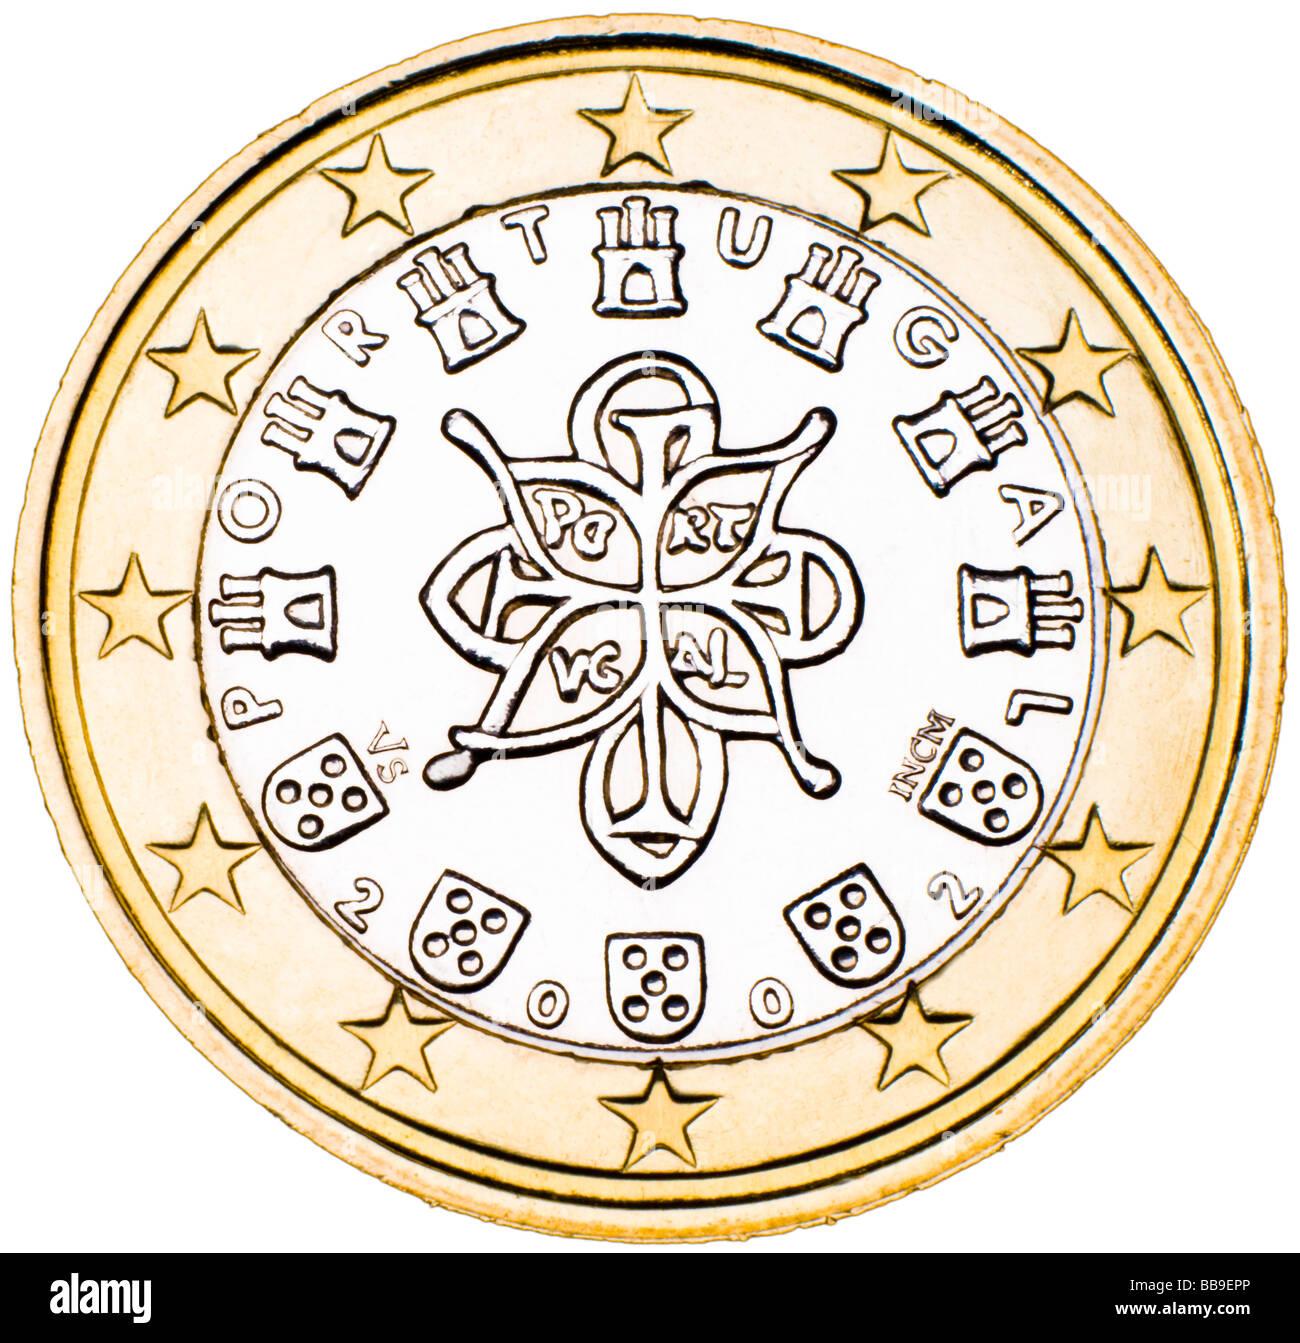 Portuguese 1 Euro Coin reverse - Stock Image